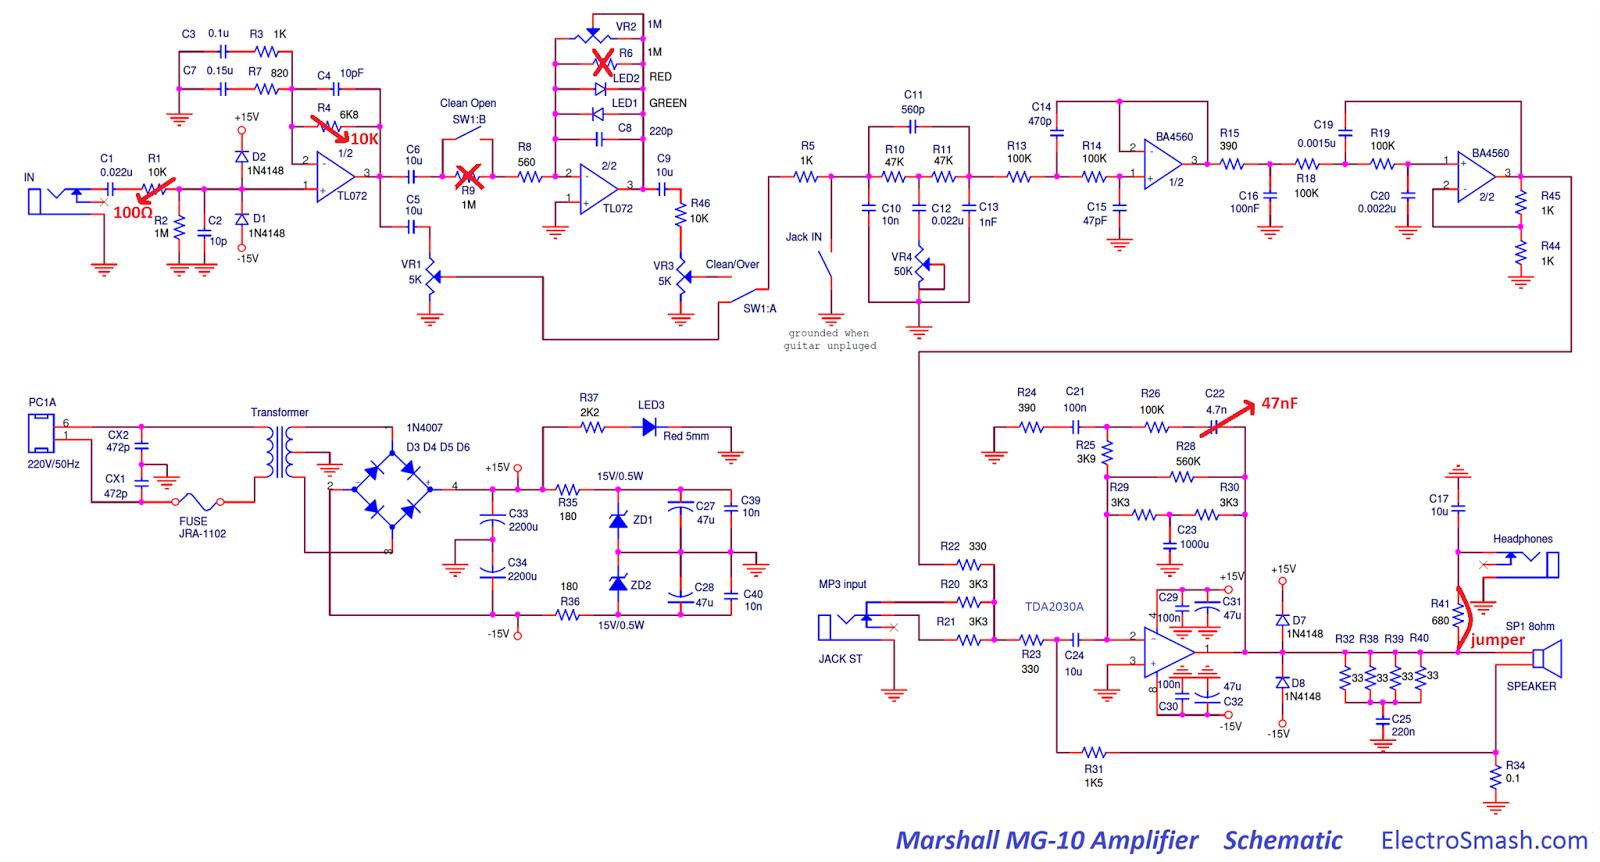 marshall mg10 modification guitar dreamer marshall mg cfx the amp sounds like a proper amplifier head unit via the 2x12\